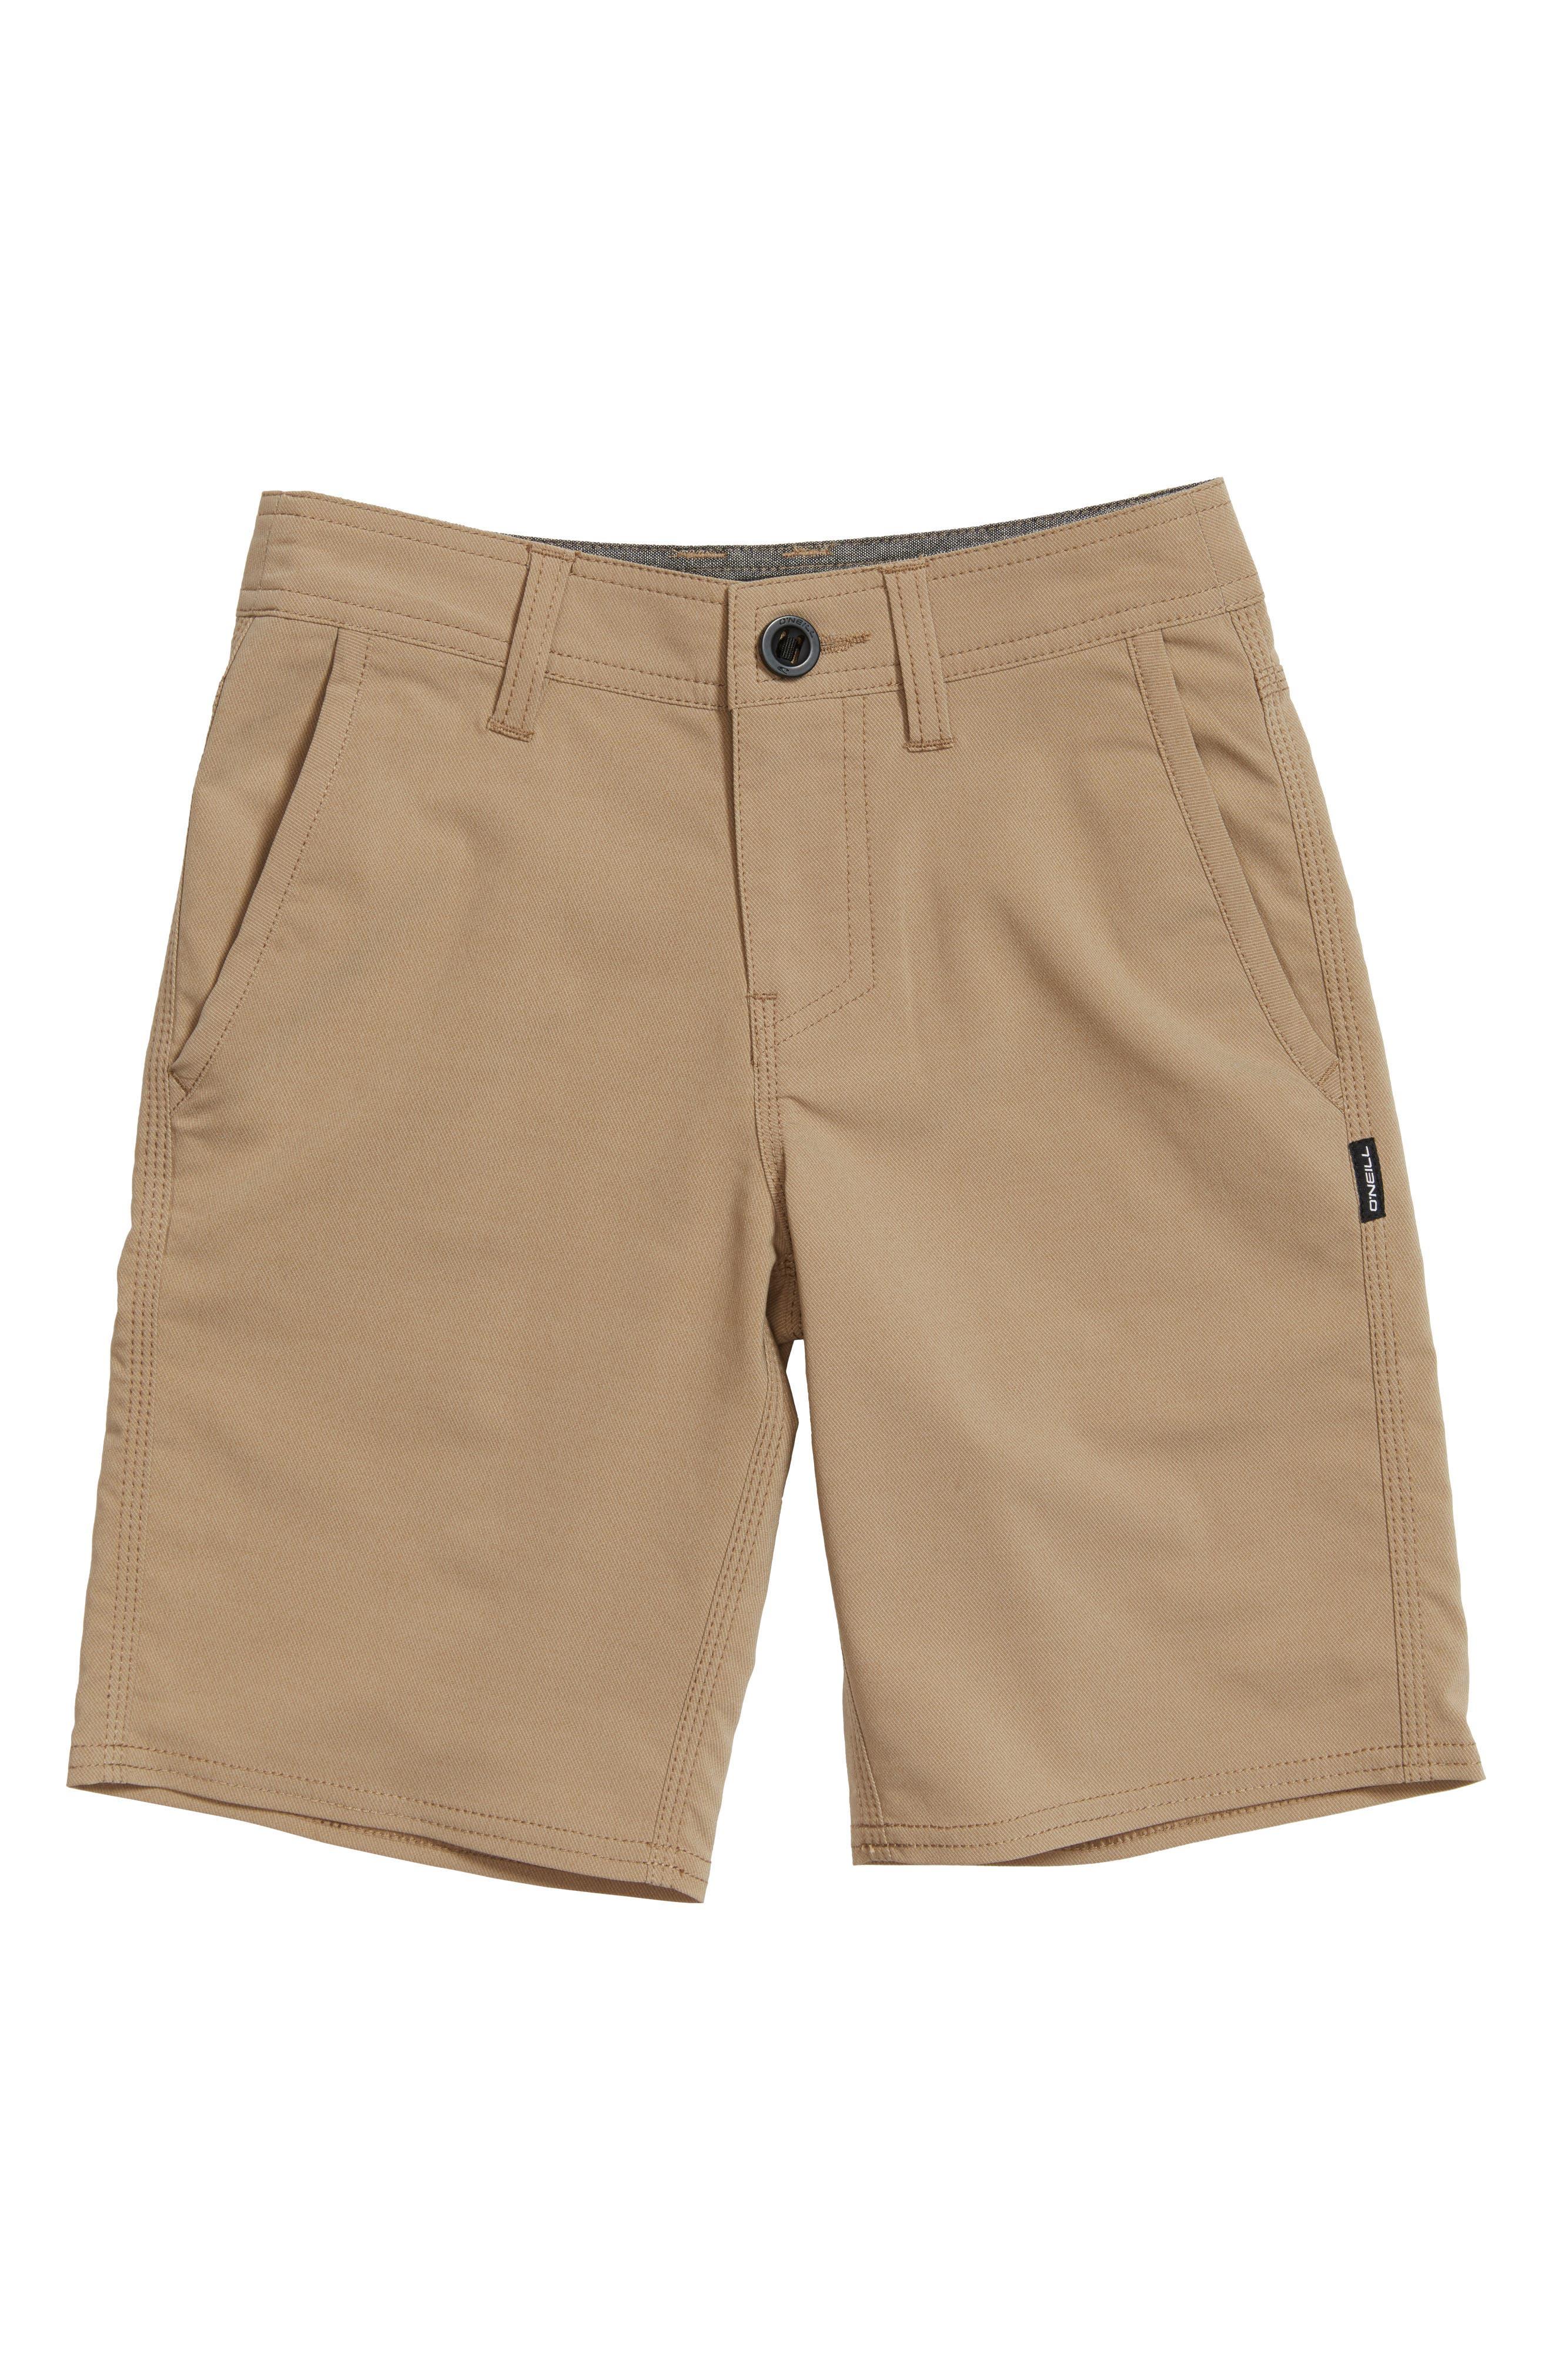 Boys ONeill Stockton Hybrid Shorts Size 23  Beige